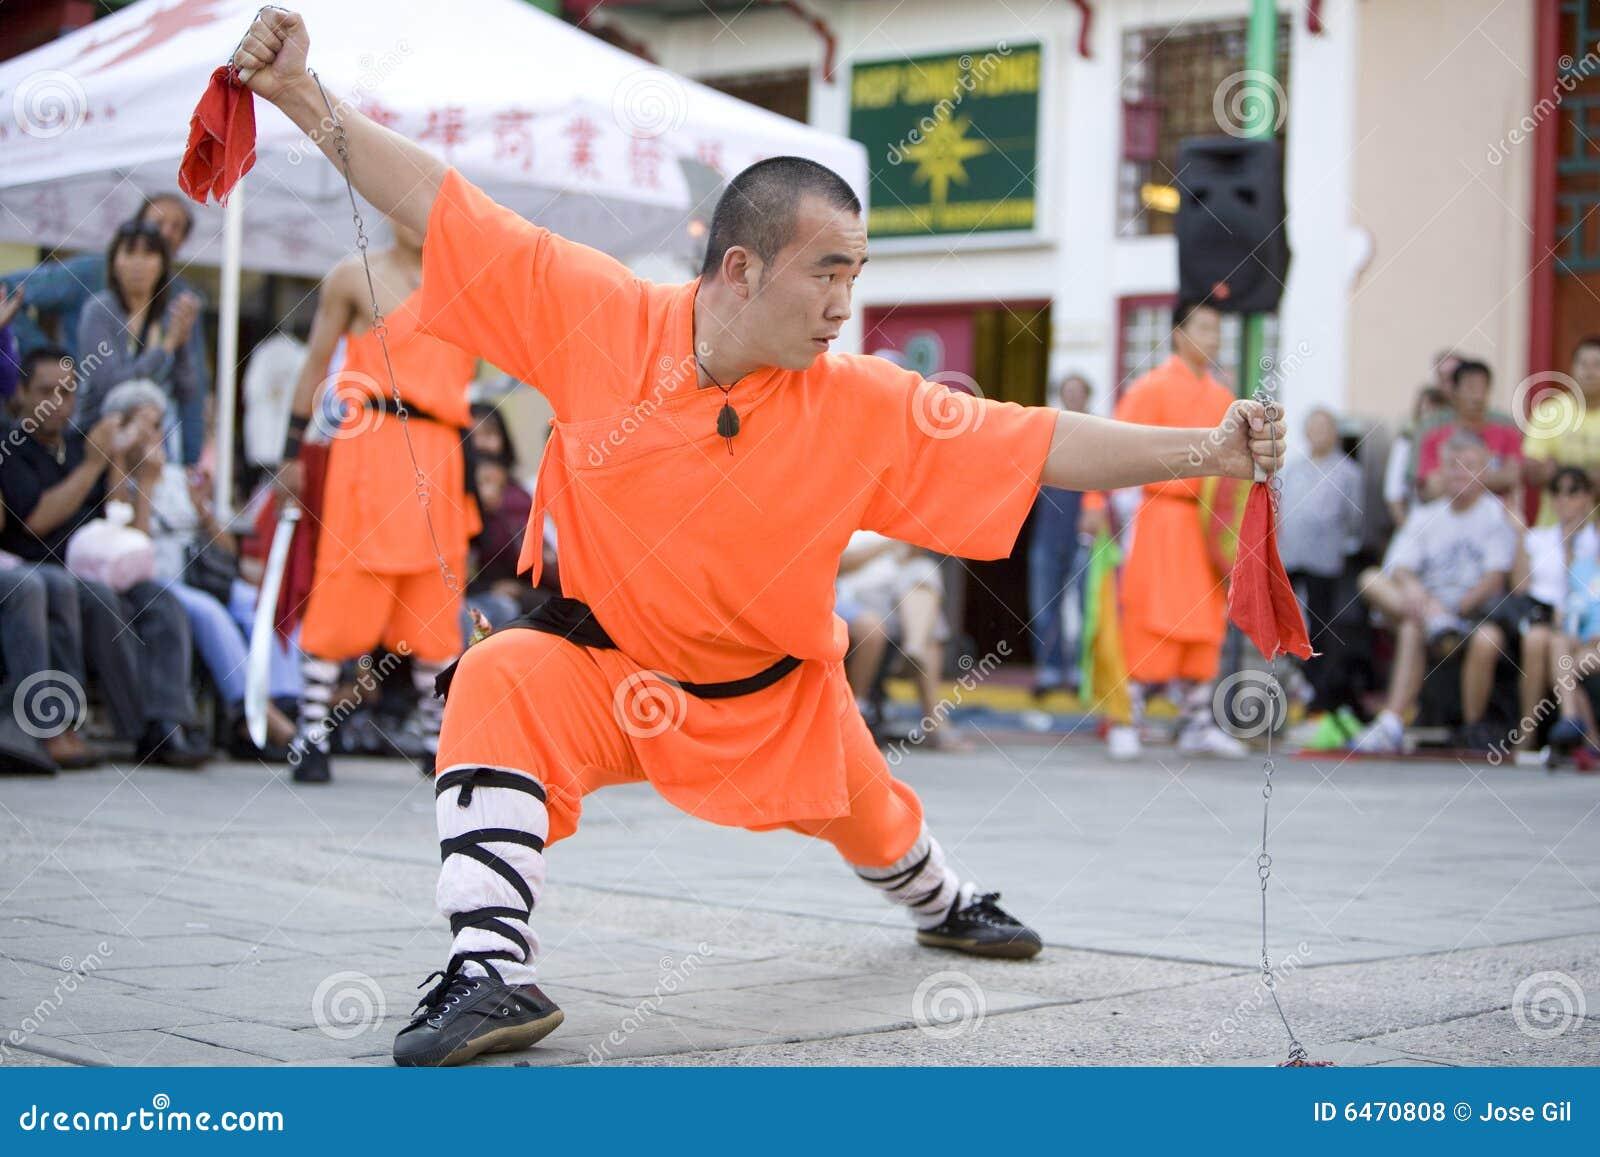 16 shaolin kung - fu.